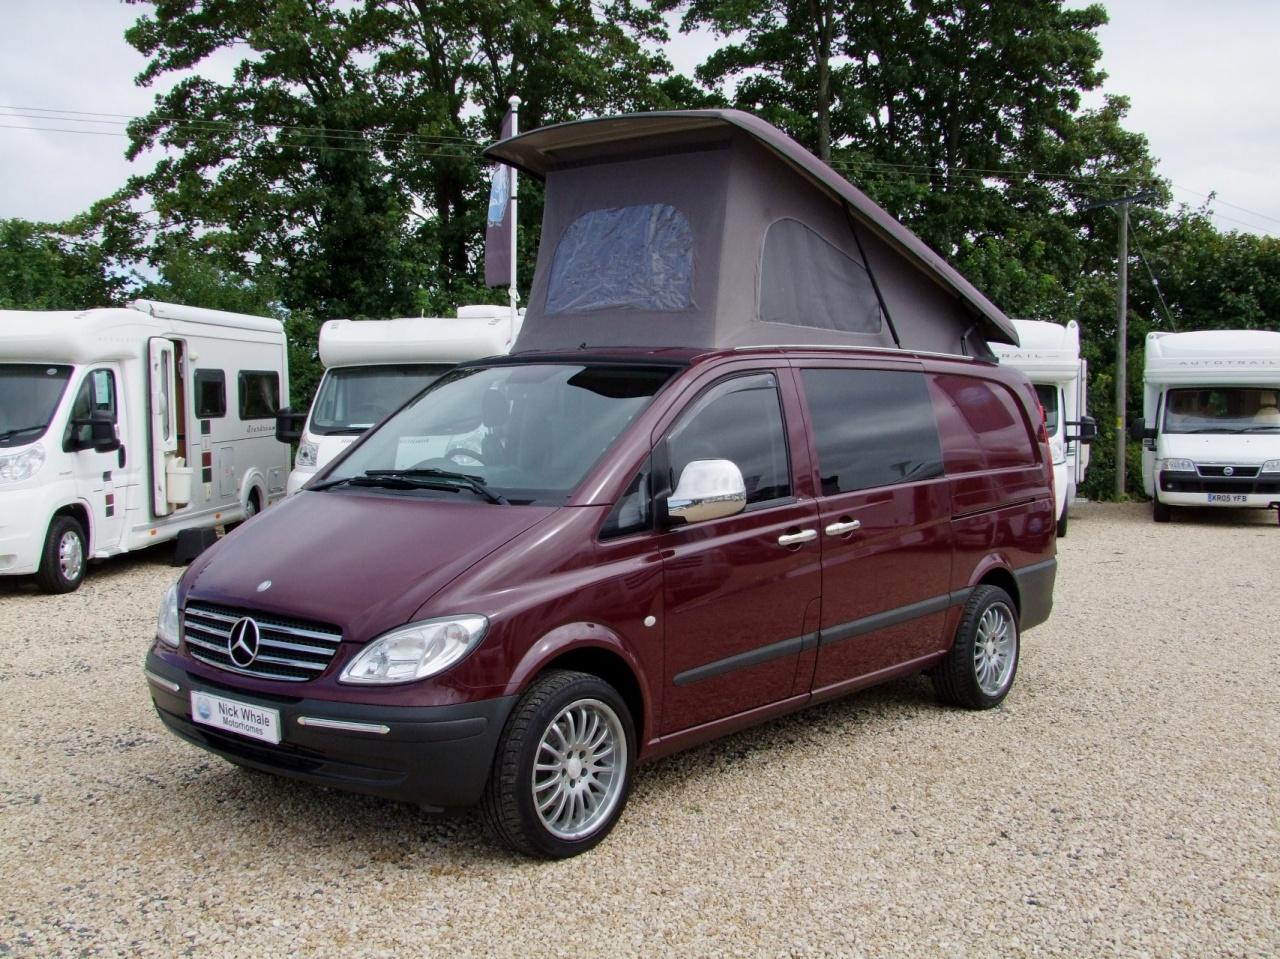 benz luxury conversion van mercedes interior mobile gallery coaches sprinter custom coach offices bespoke